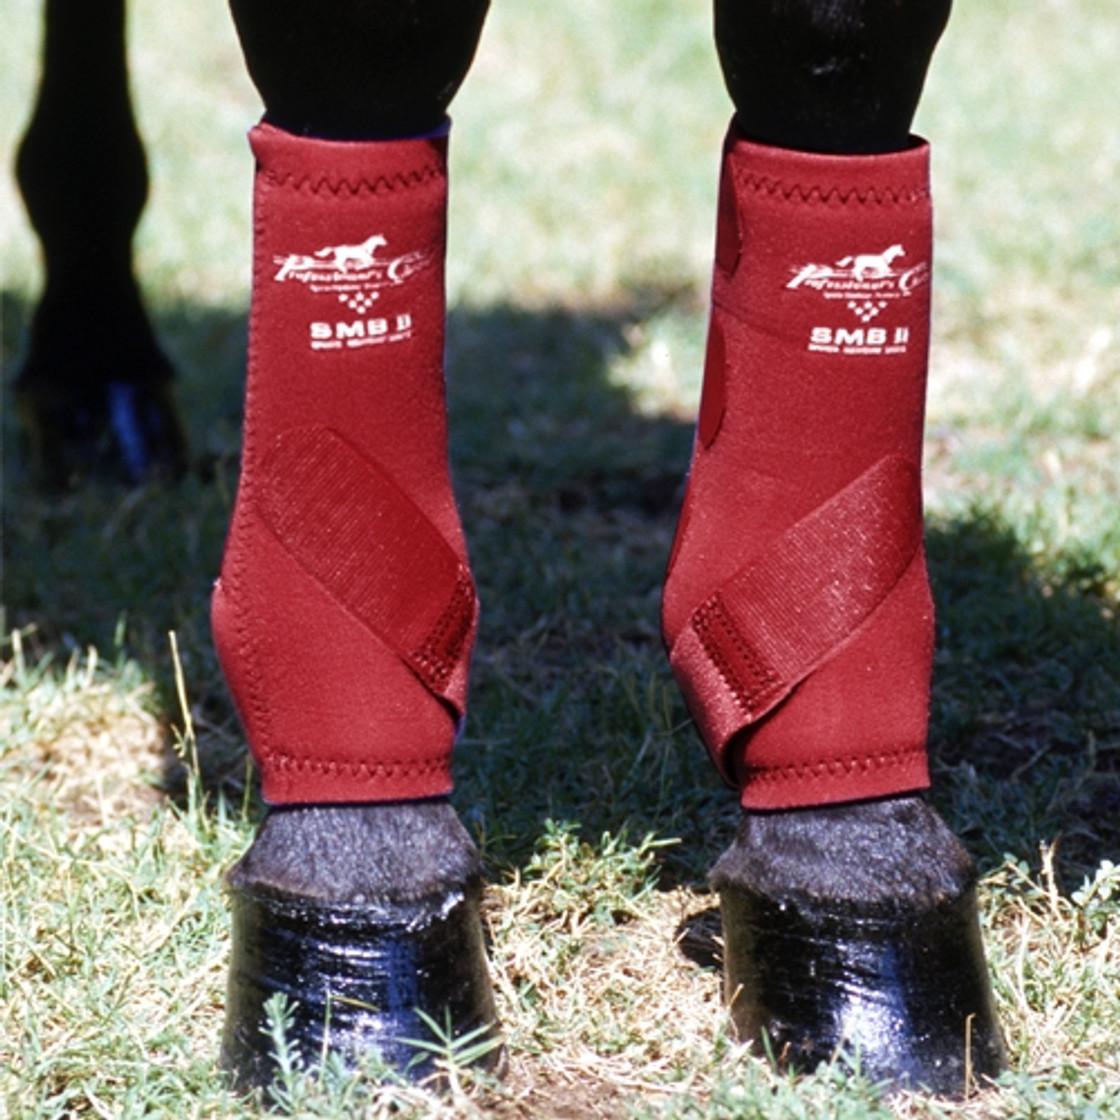 Prof Choice SMBII Boots